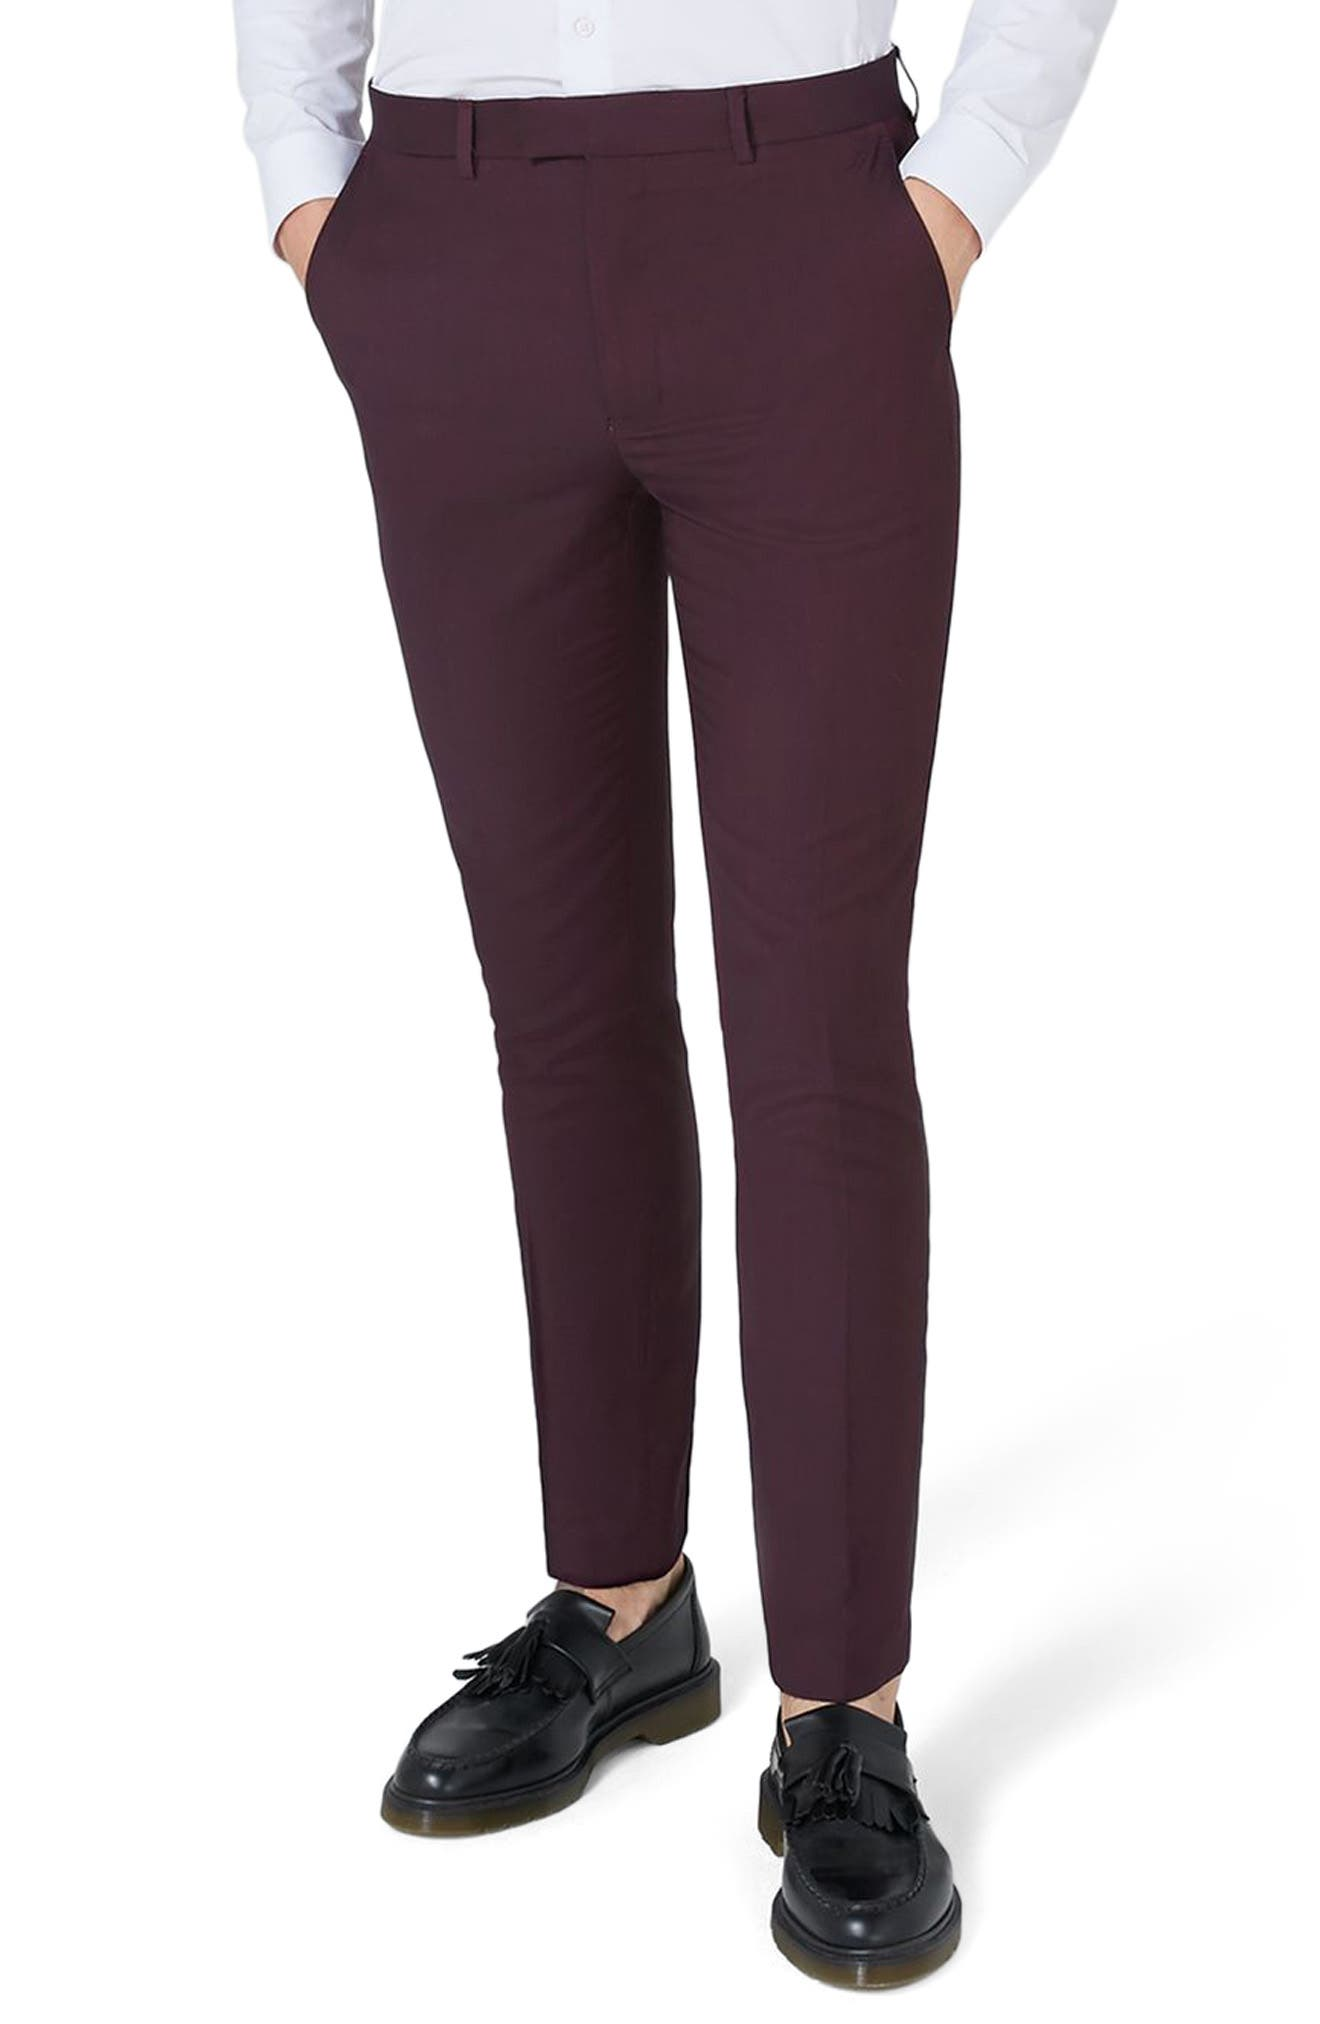 Topman Skinny Fit Plum Suit Trousers